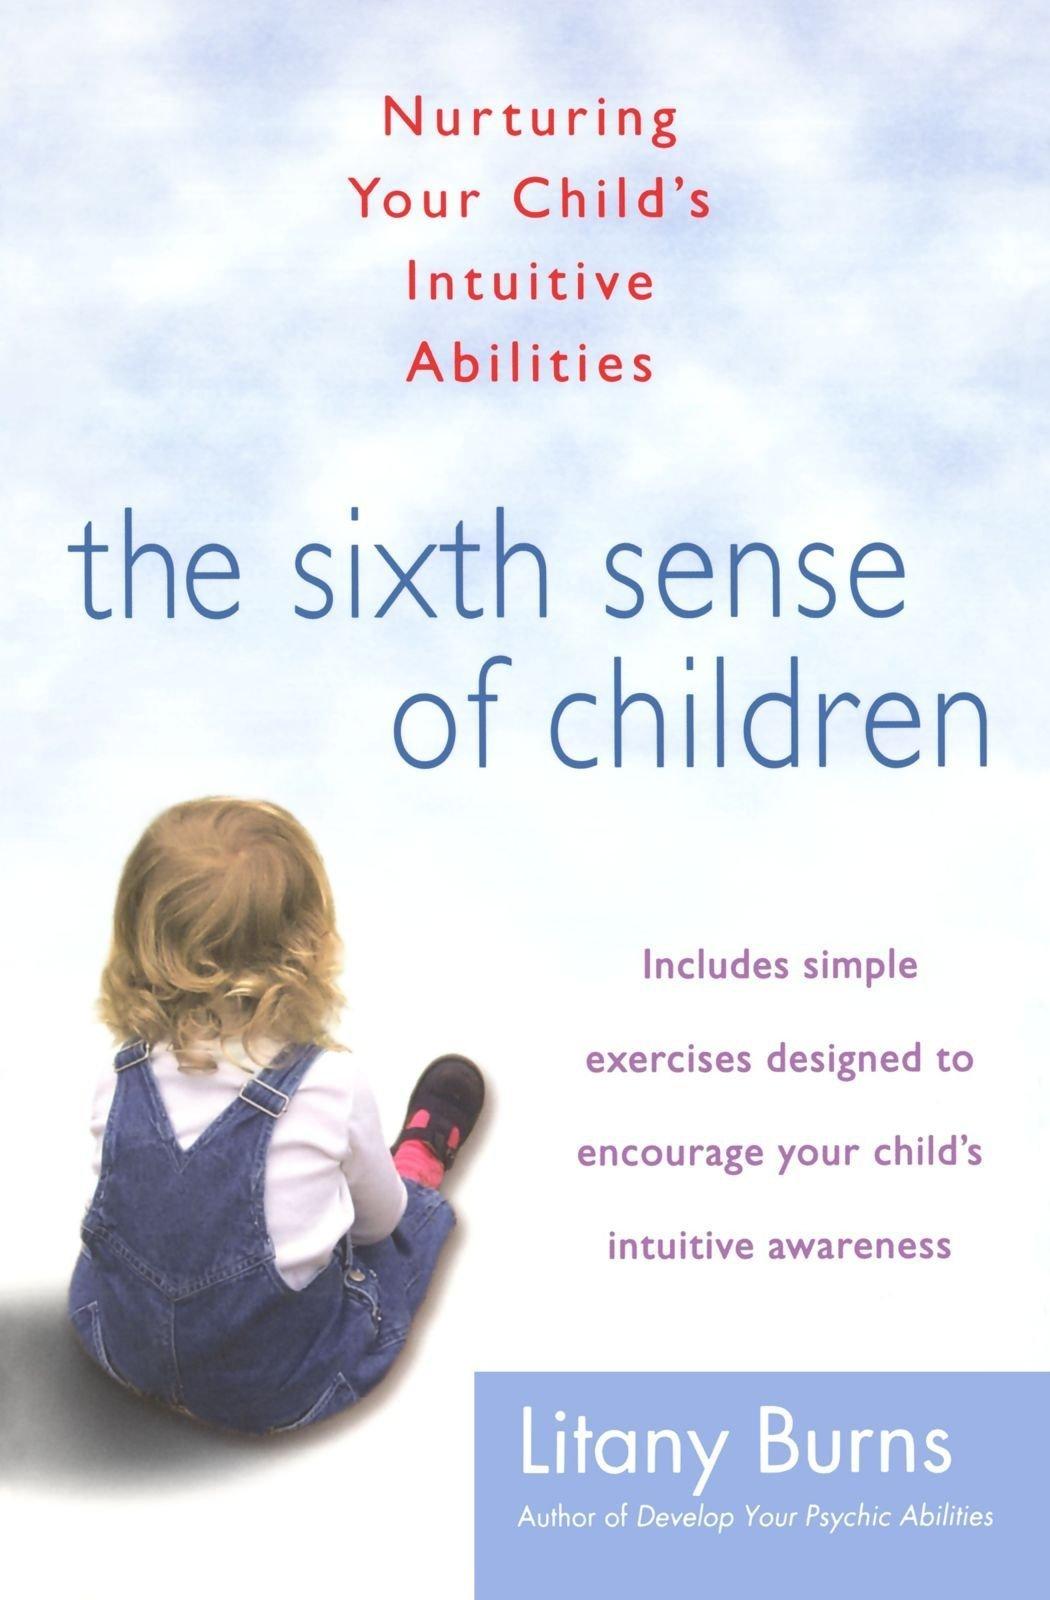 Amazon: The Sixth Sense Of Children (9780451205254): Litany Burns: Books